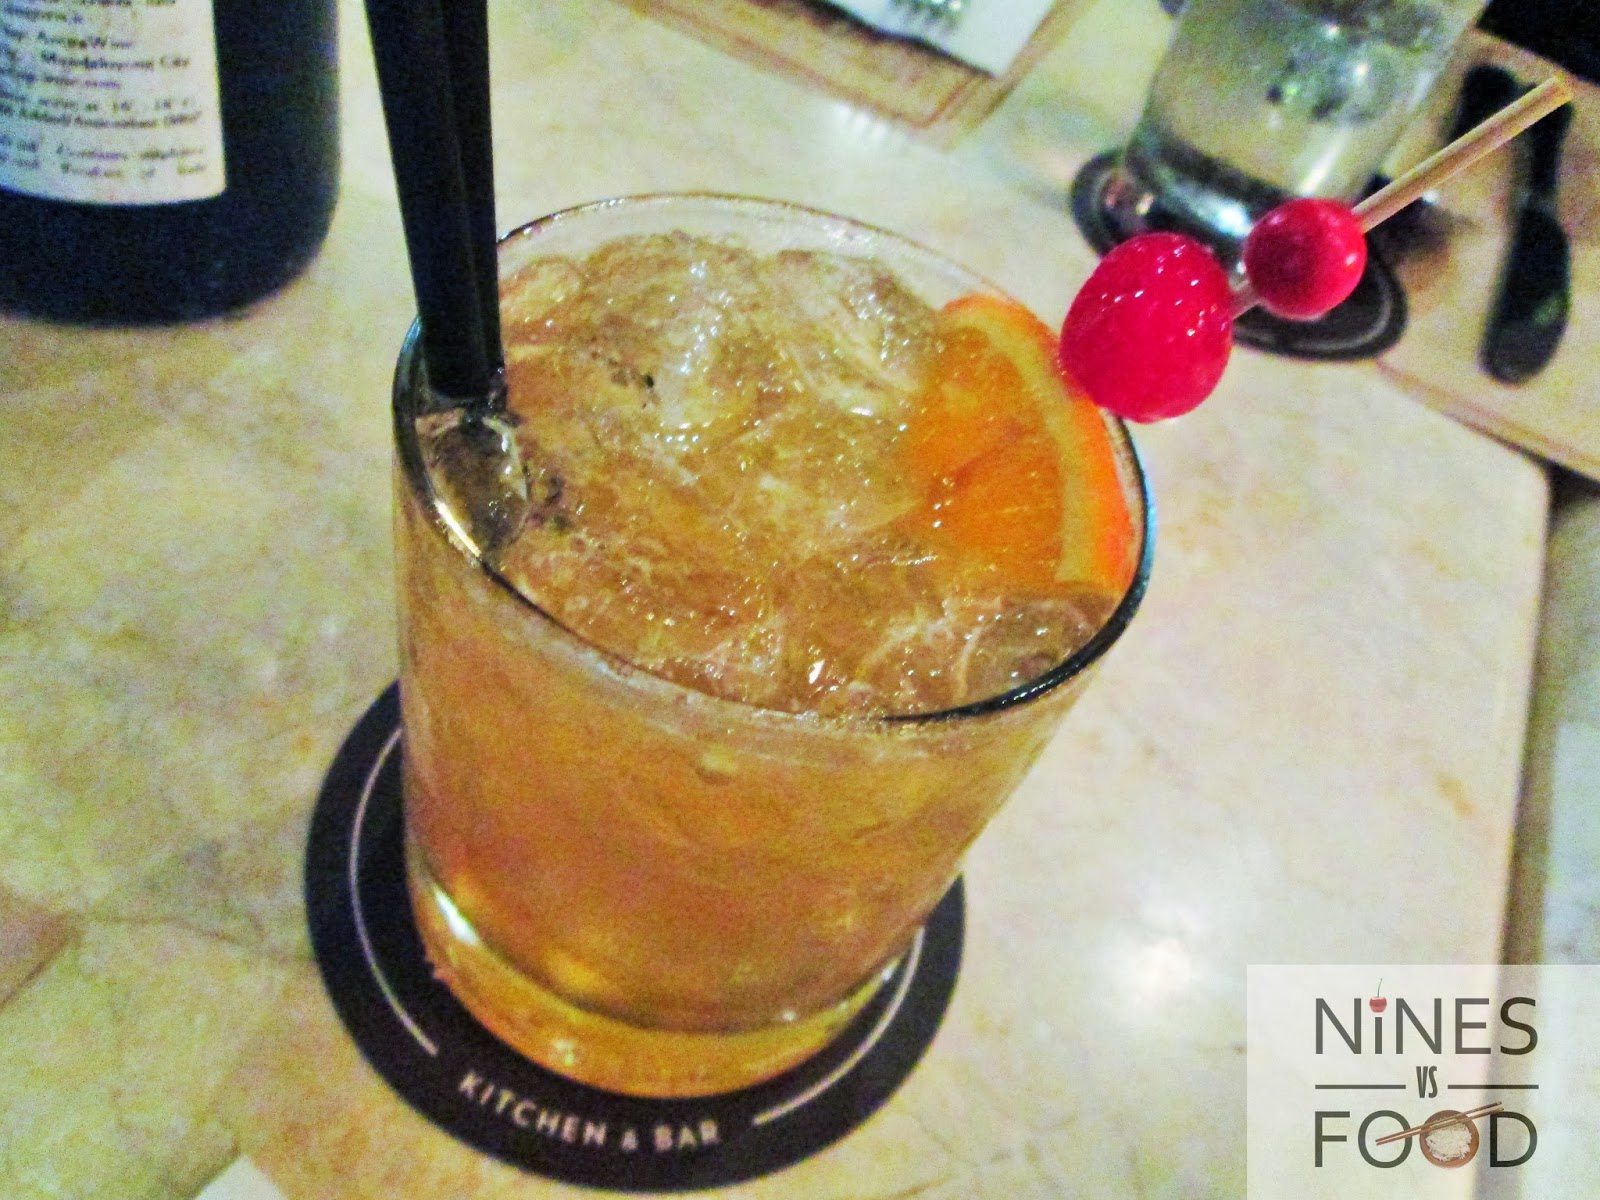 Nines vs. Food - Olive Tree Kitchen and Bar-9.jpg